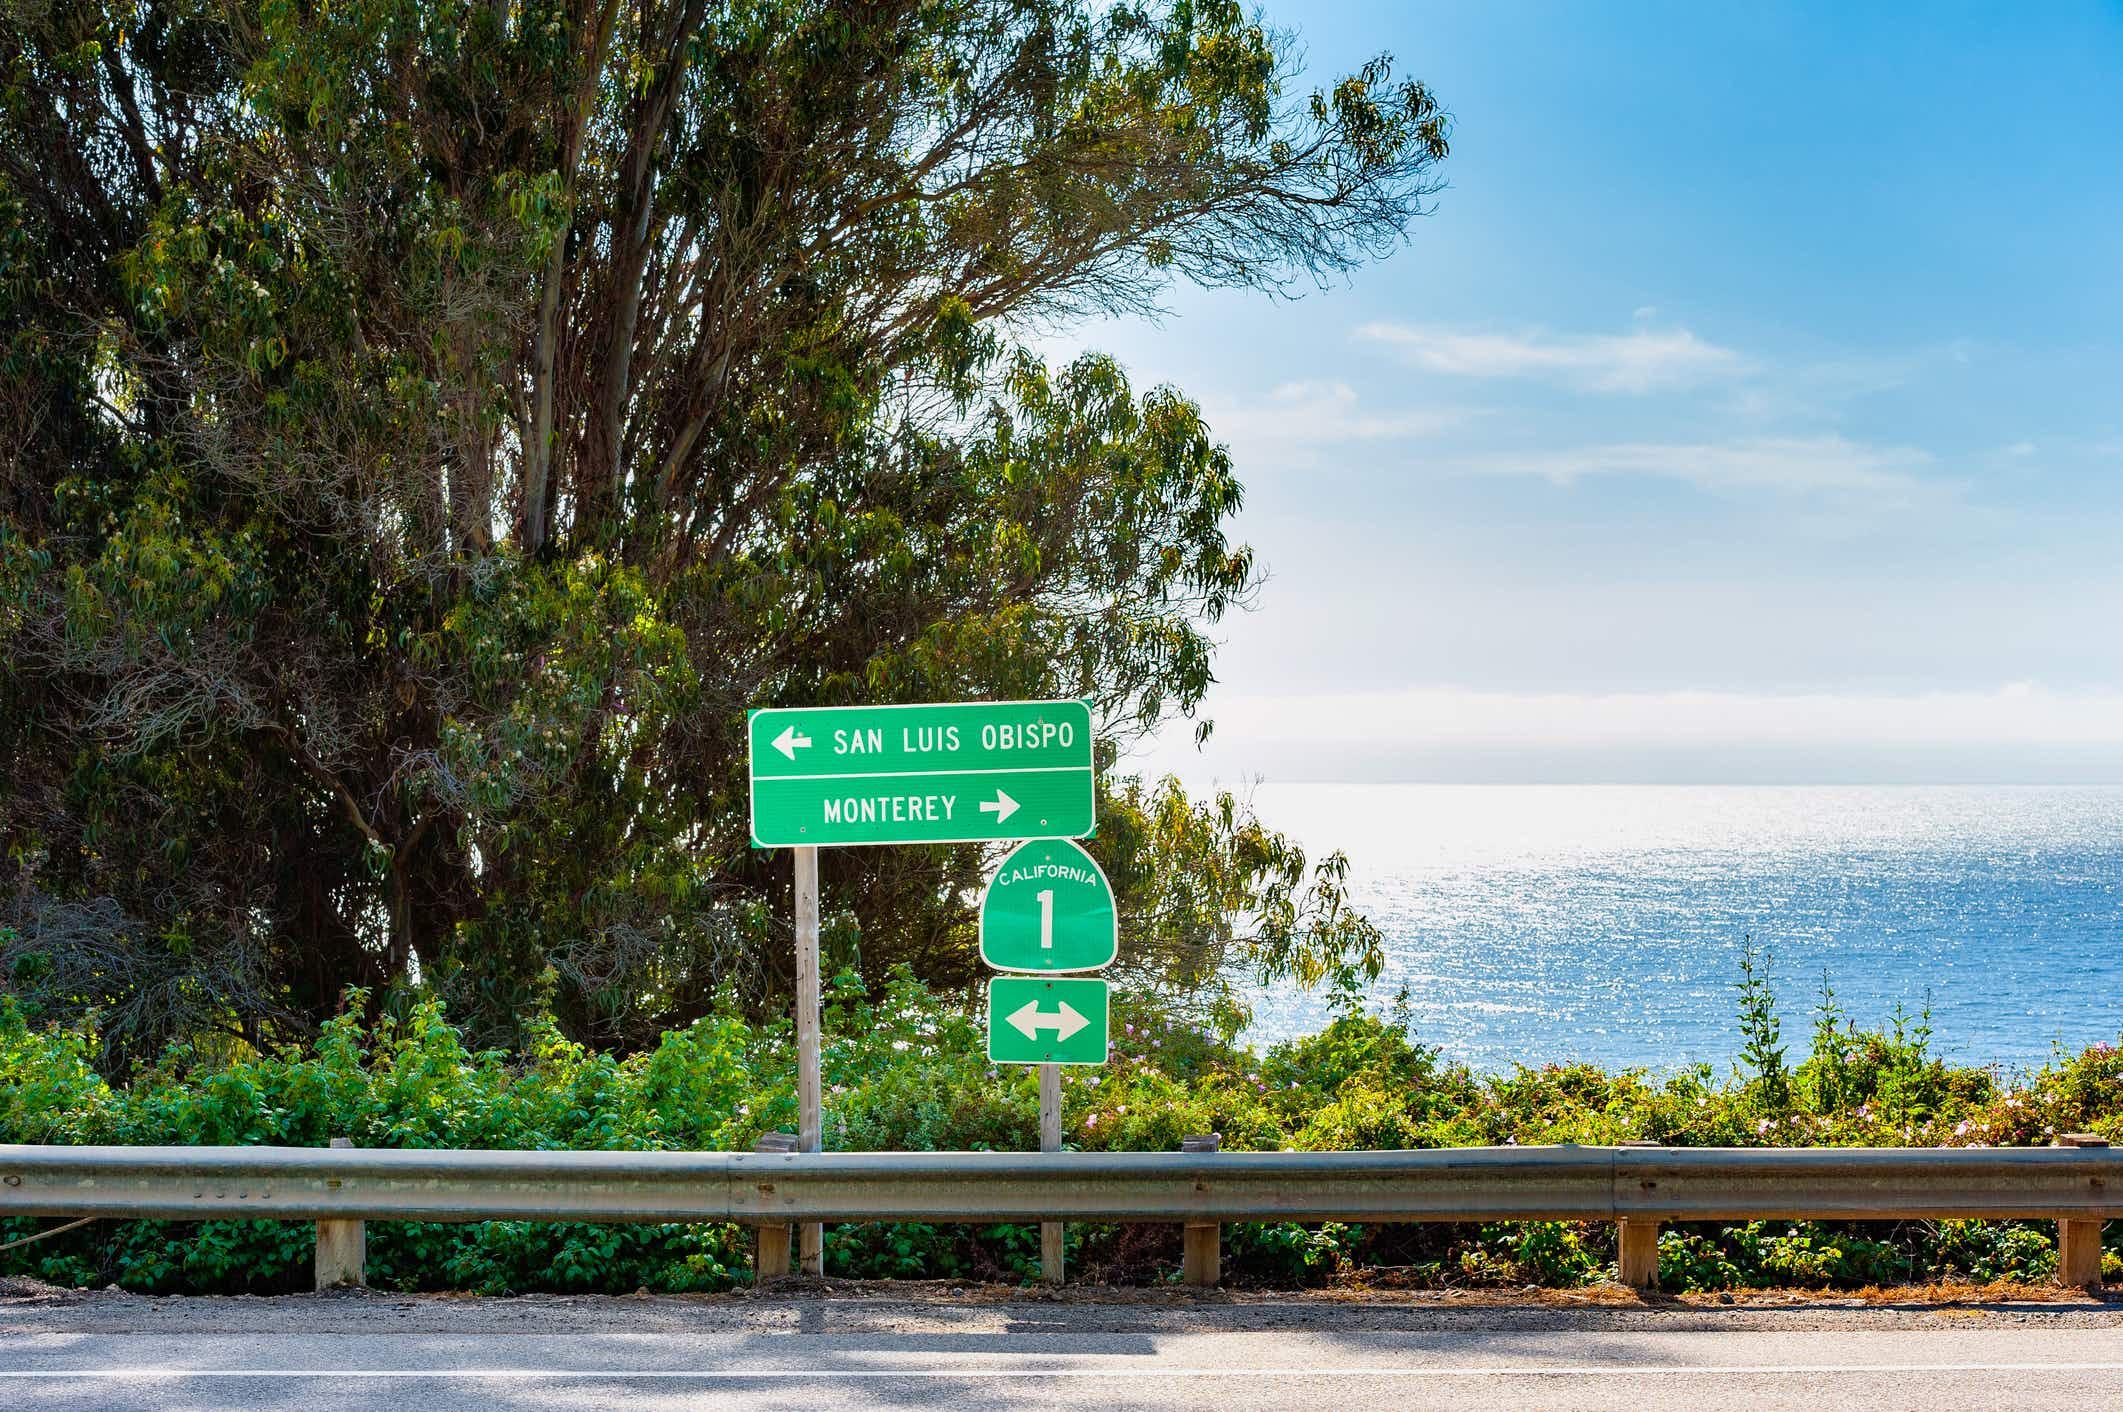 Road trips resume on California's Highway 1 as bridge reopens